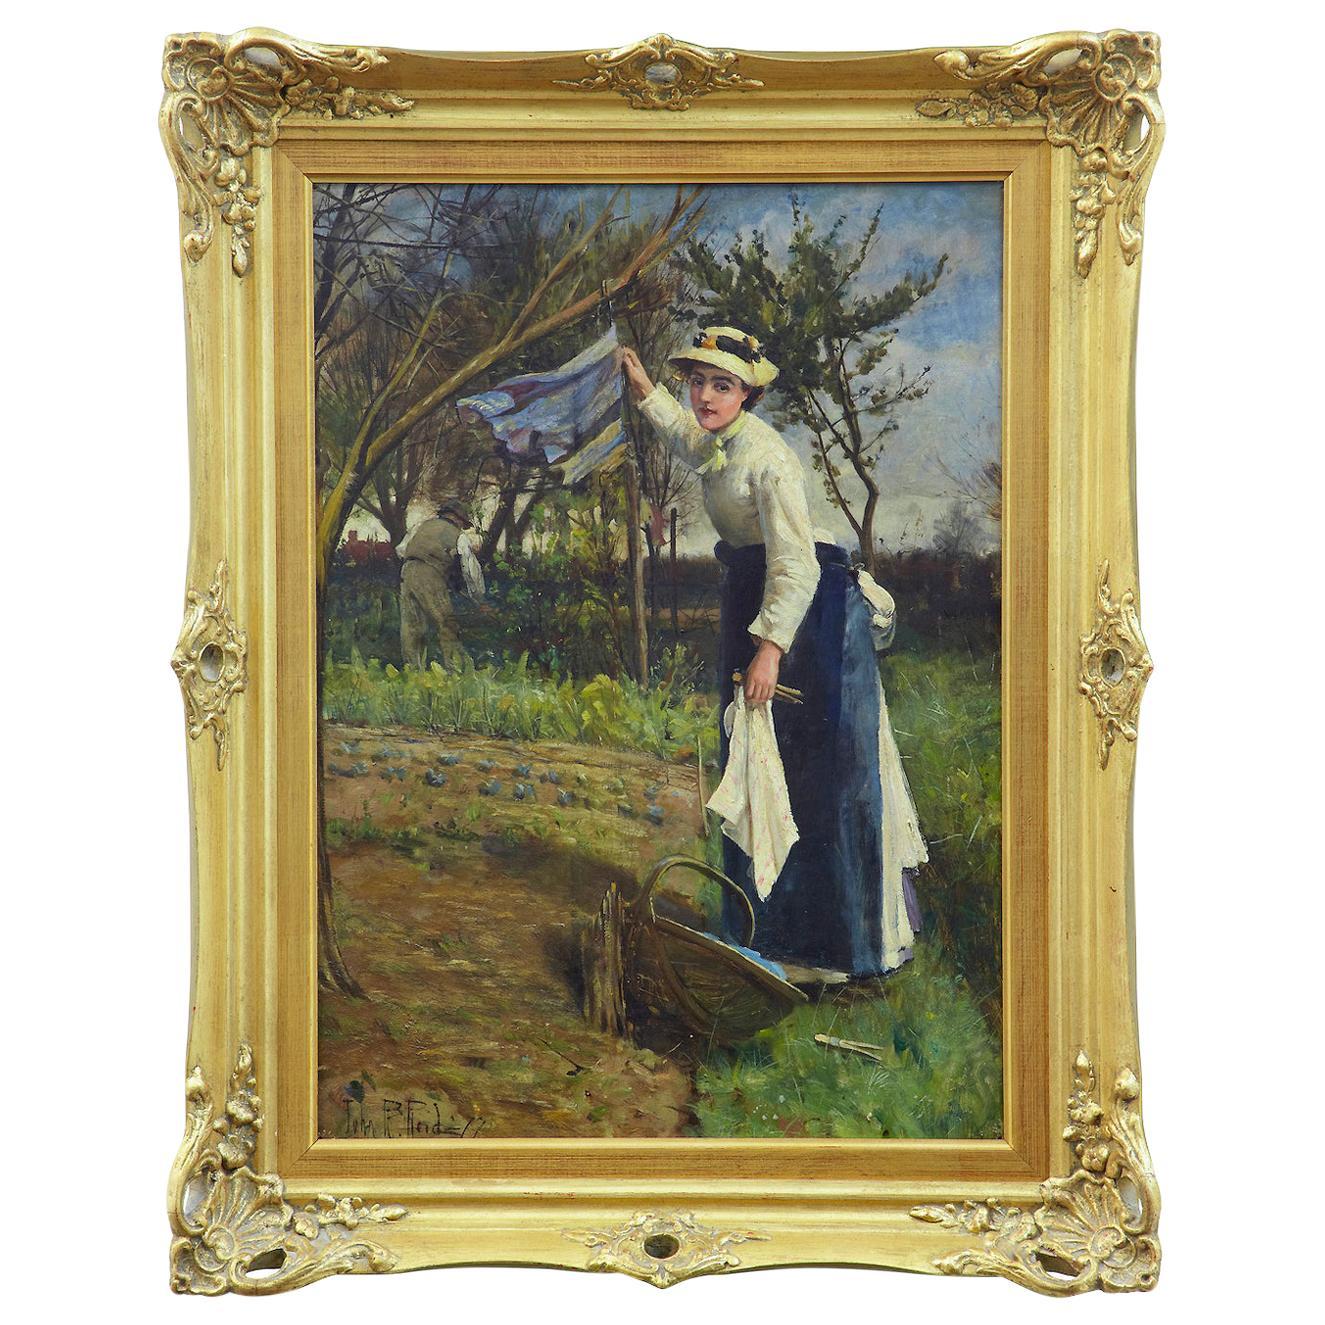 19th Century Oil on Canvas Rural Scene by John Robertson Reid